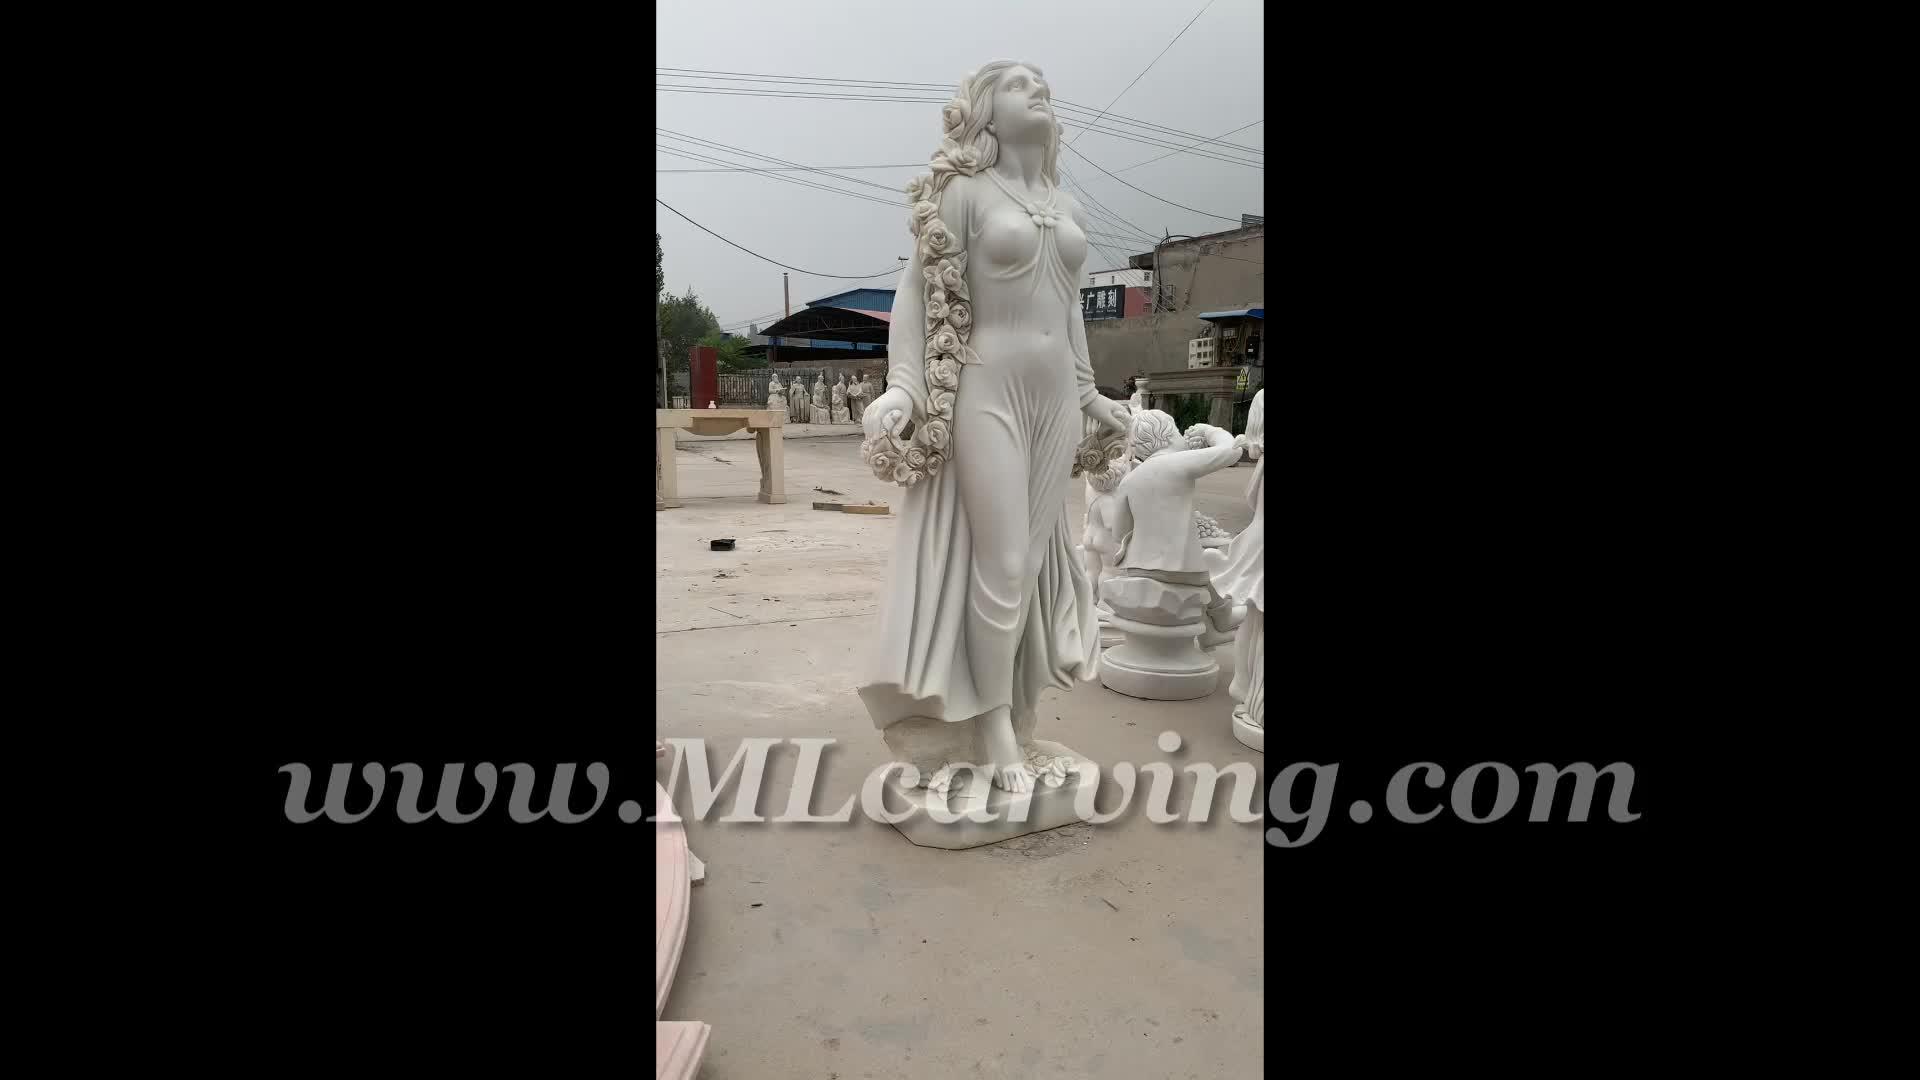 Taille de La Vie en plein air Femmes Statue de Jardin en Marbre MLcarving 191109DLN